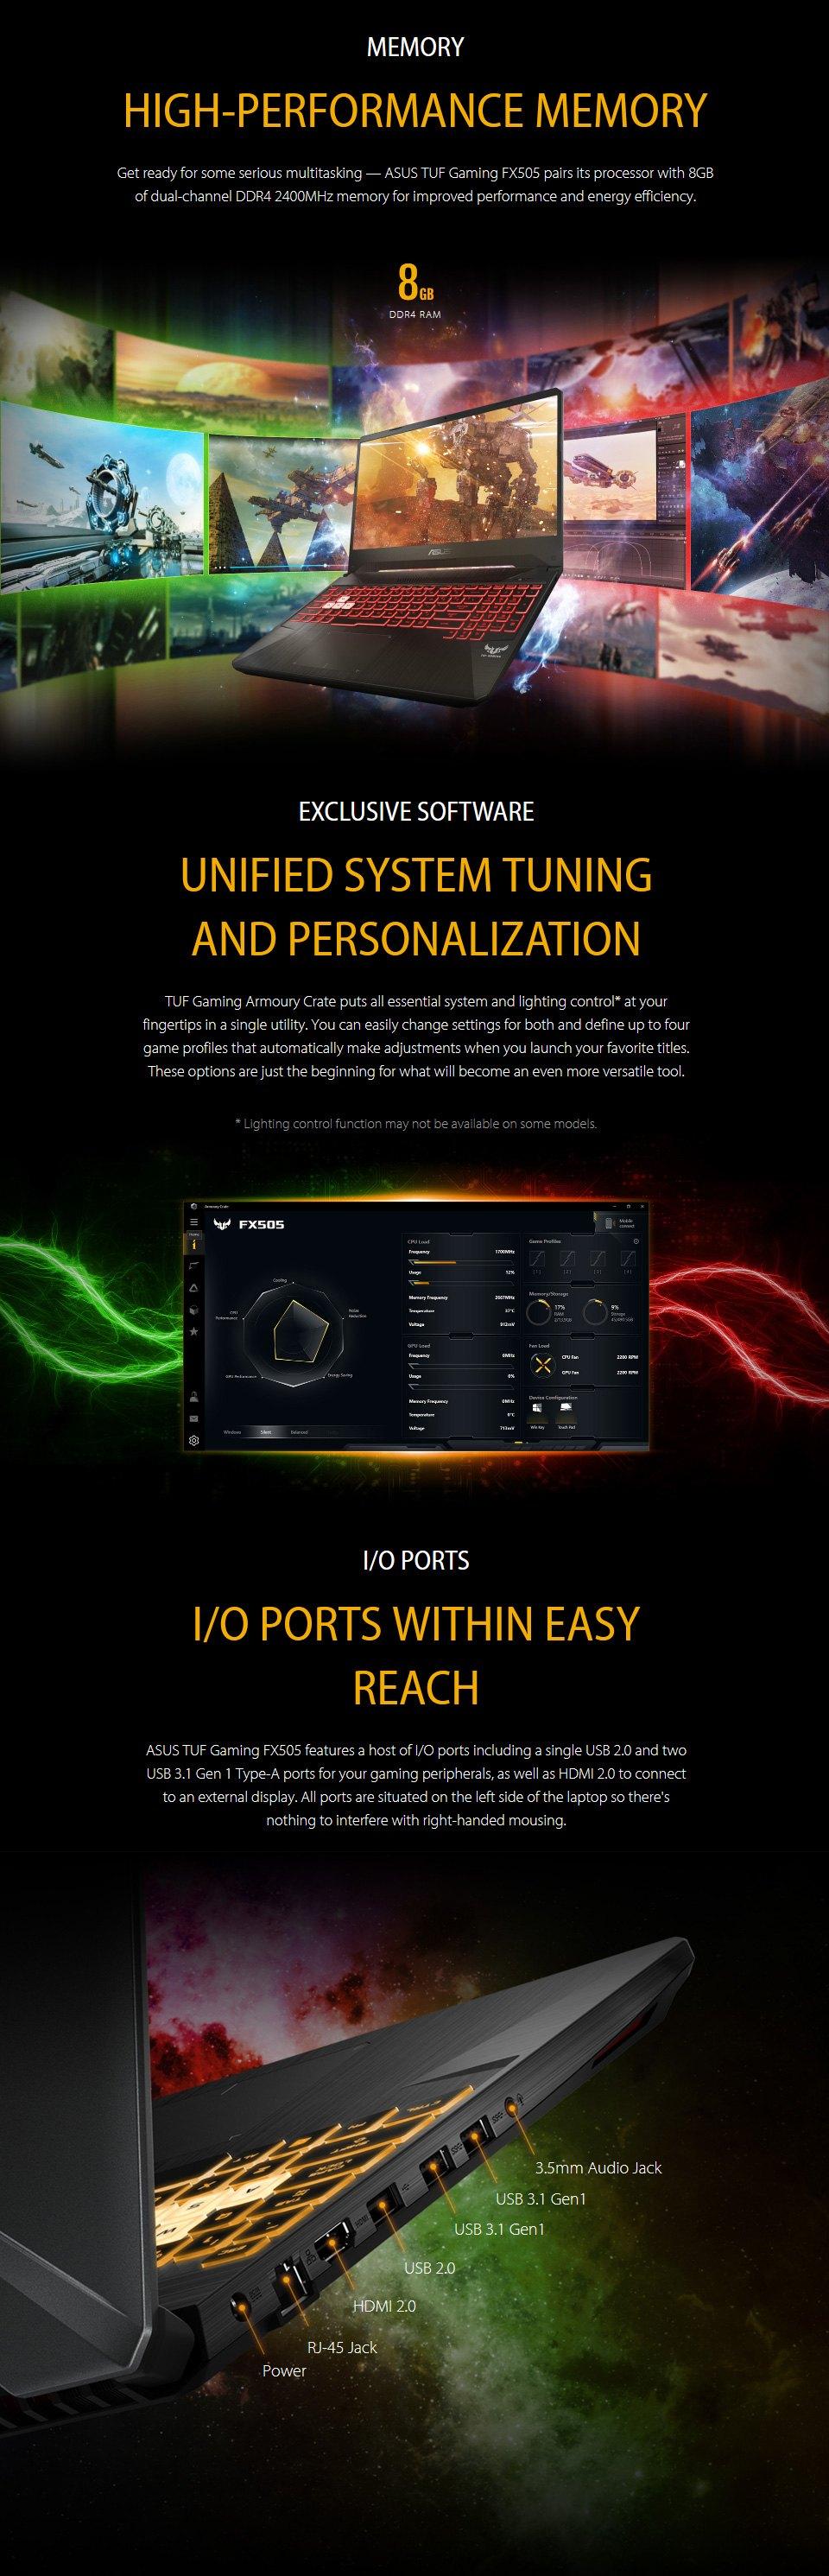 ASUS TUF AMD Ryzen 5 GeForce GTX 1650 15.6in Notebook features 4